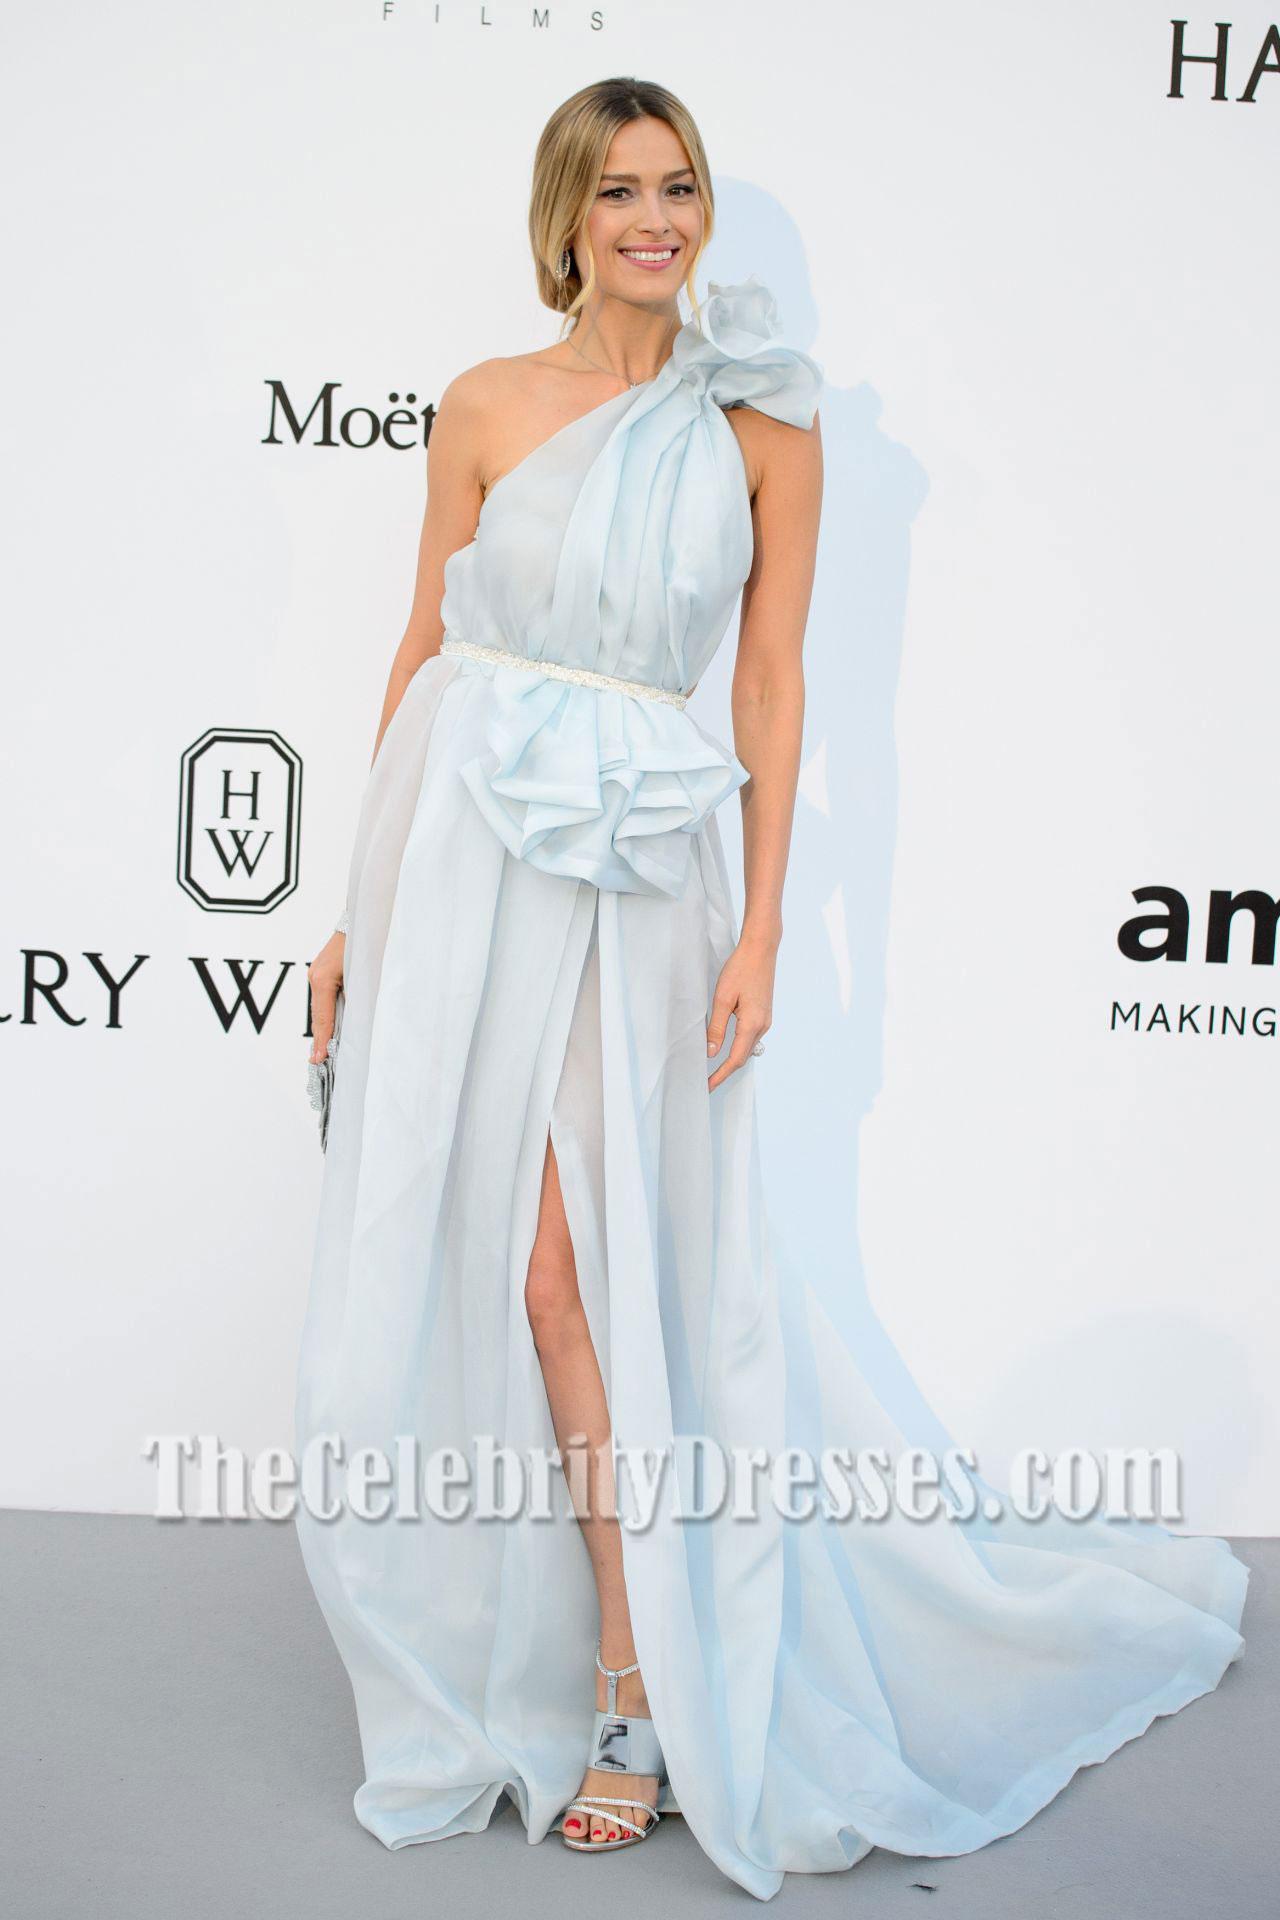 Petra Nemcova Baby Blue e shoulder Ruffle Slie Evening Dress amfAR